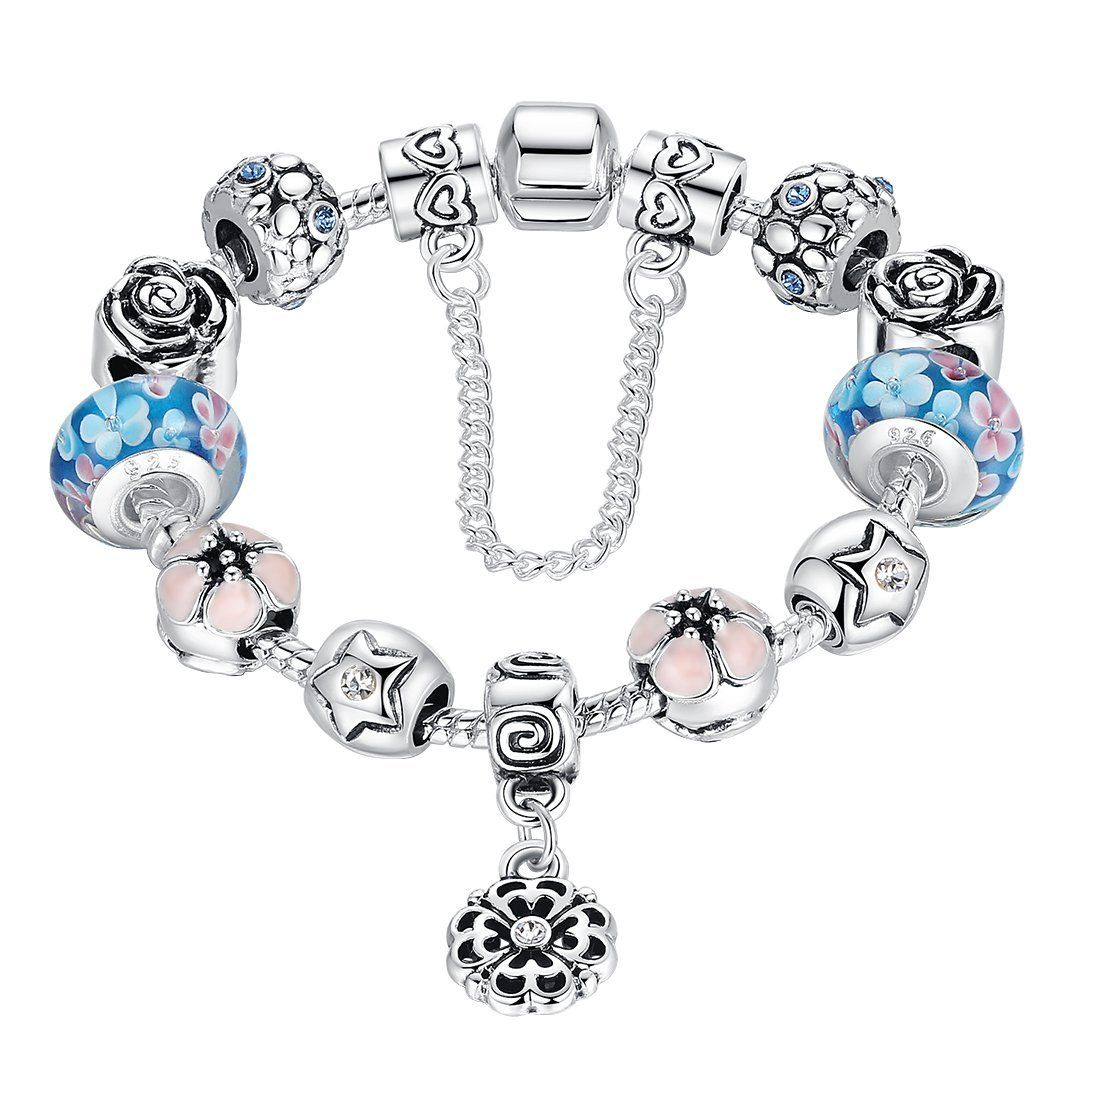 https://www.amazon.co.uk/Wostu-Crystals-Pendants-European-Bracelets/dp/B01MTO952H/ref=pd_sim_197_5?_encoding=UTF8: